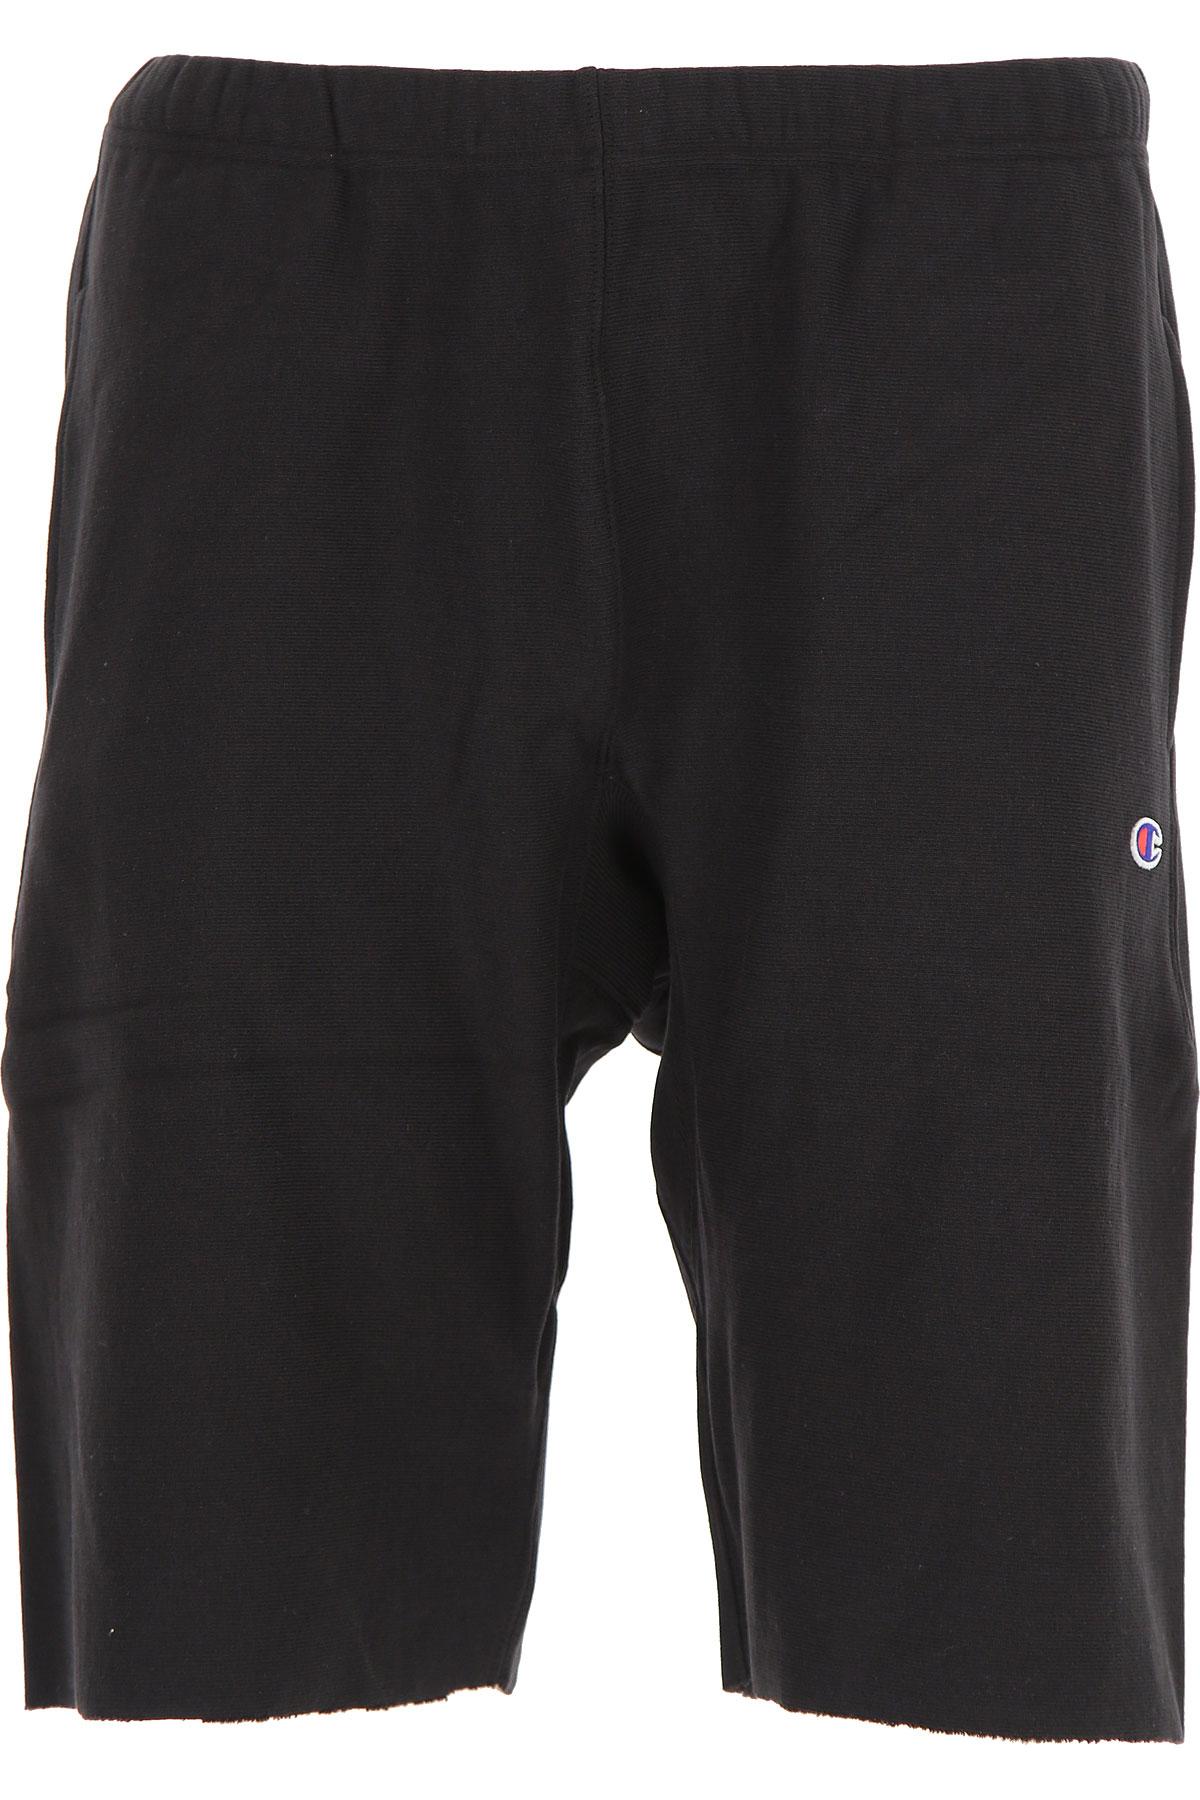 Image of Champion Shorts for Men On Sale, Black, Cotton, 2017, L XL